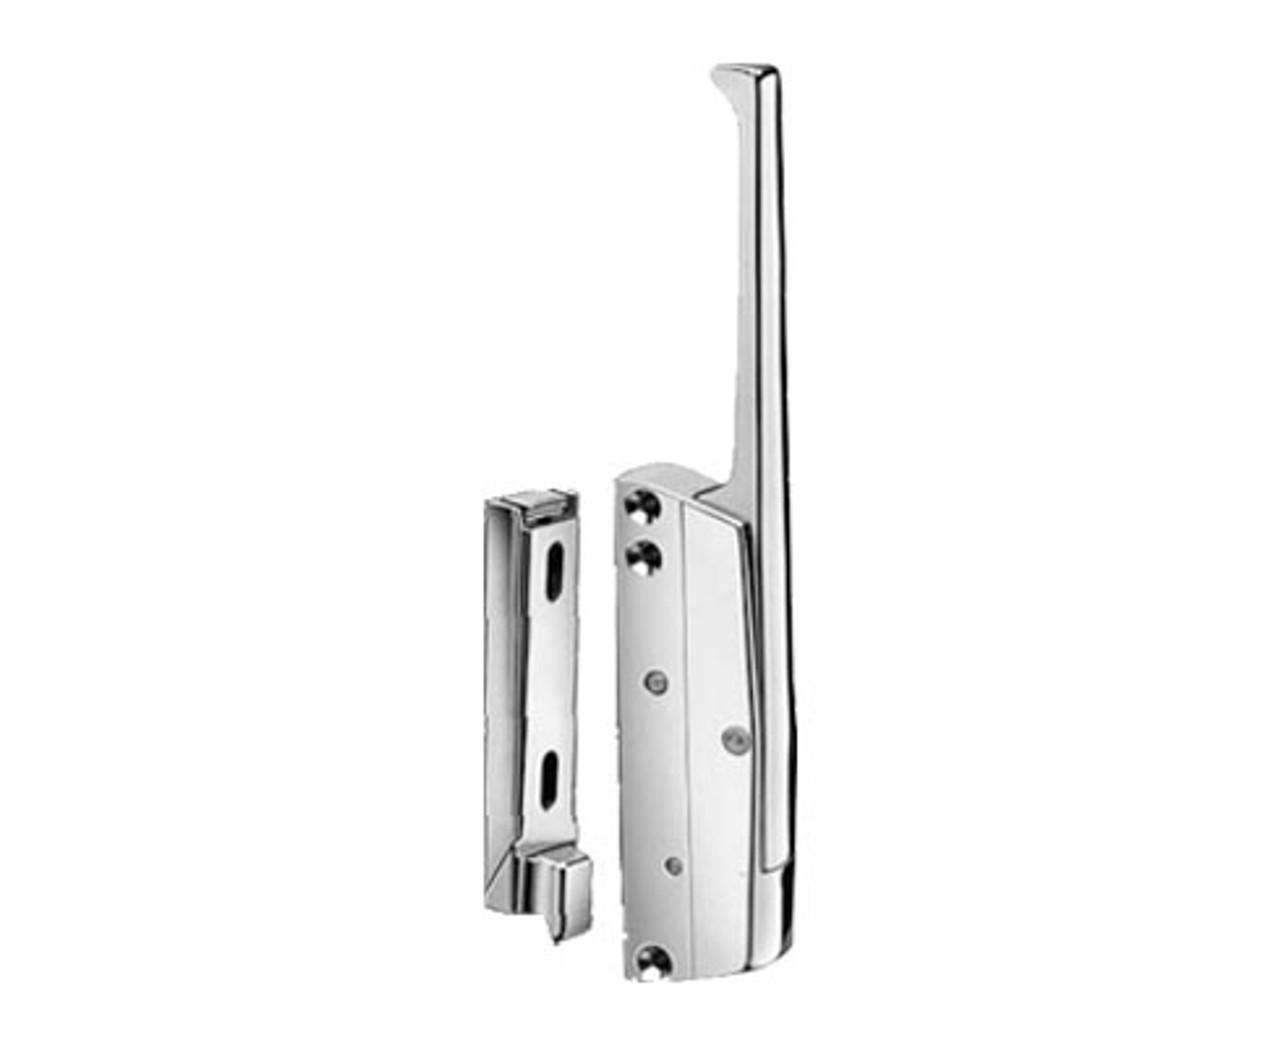 Kason-172-series-latch-10172000006-10172B00006-10172C00006-10172BC0006